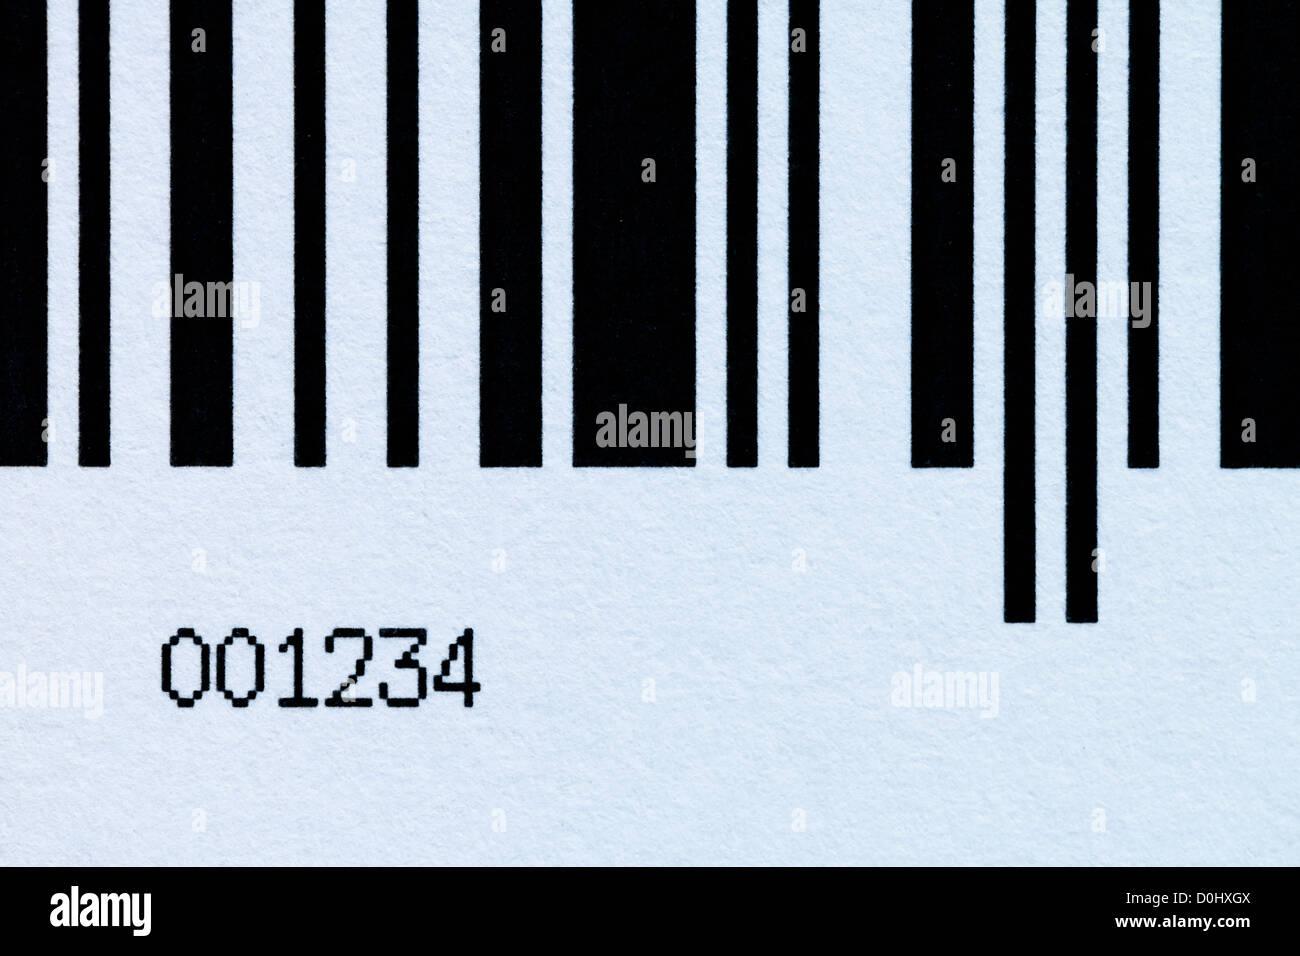 Barcode - Stock Image